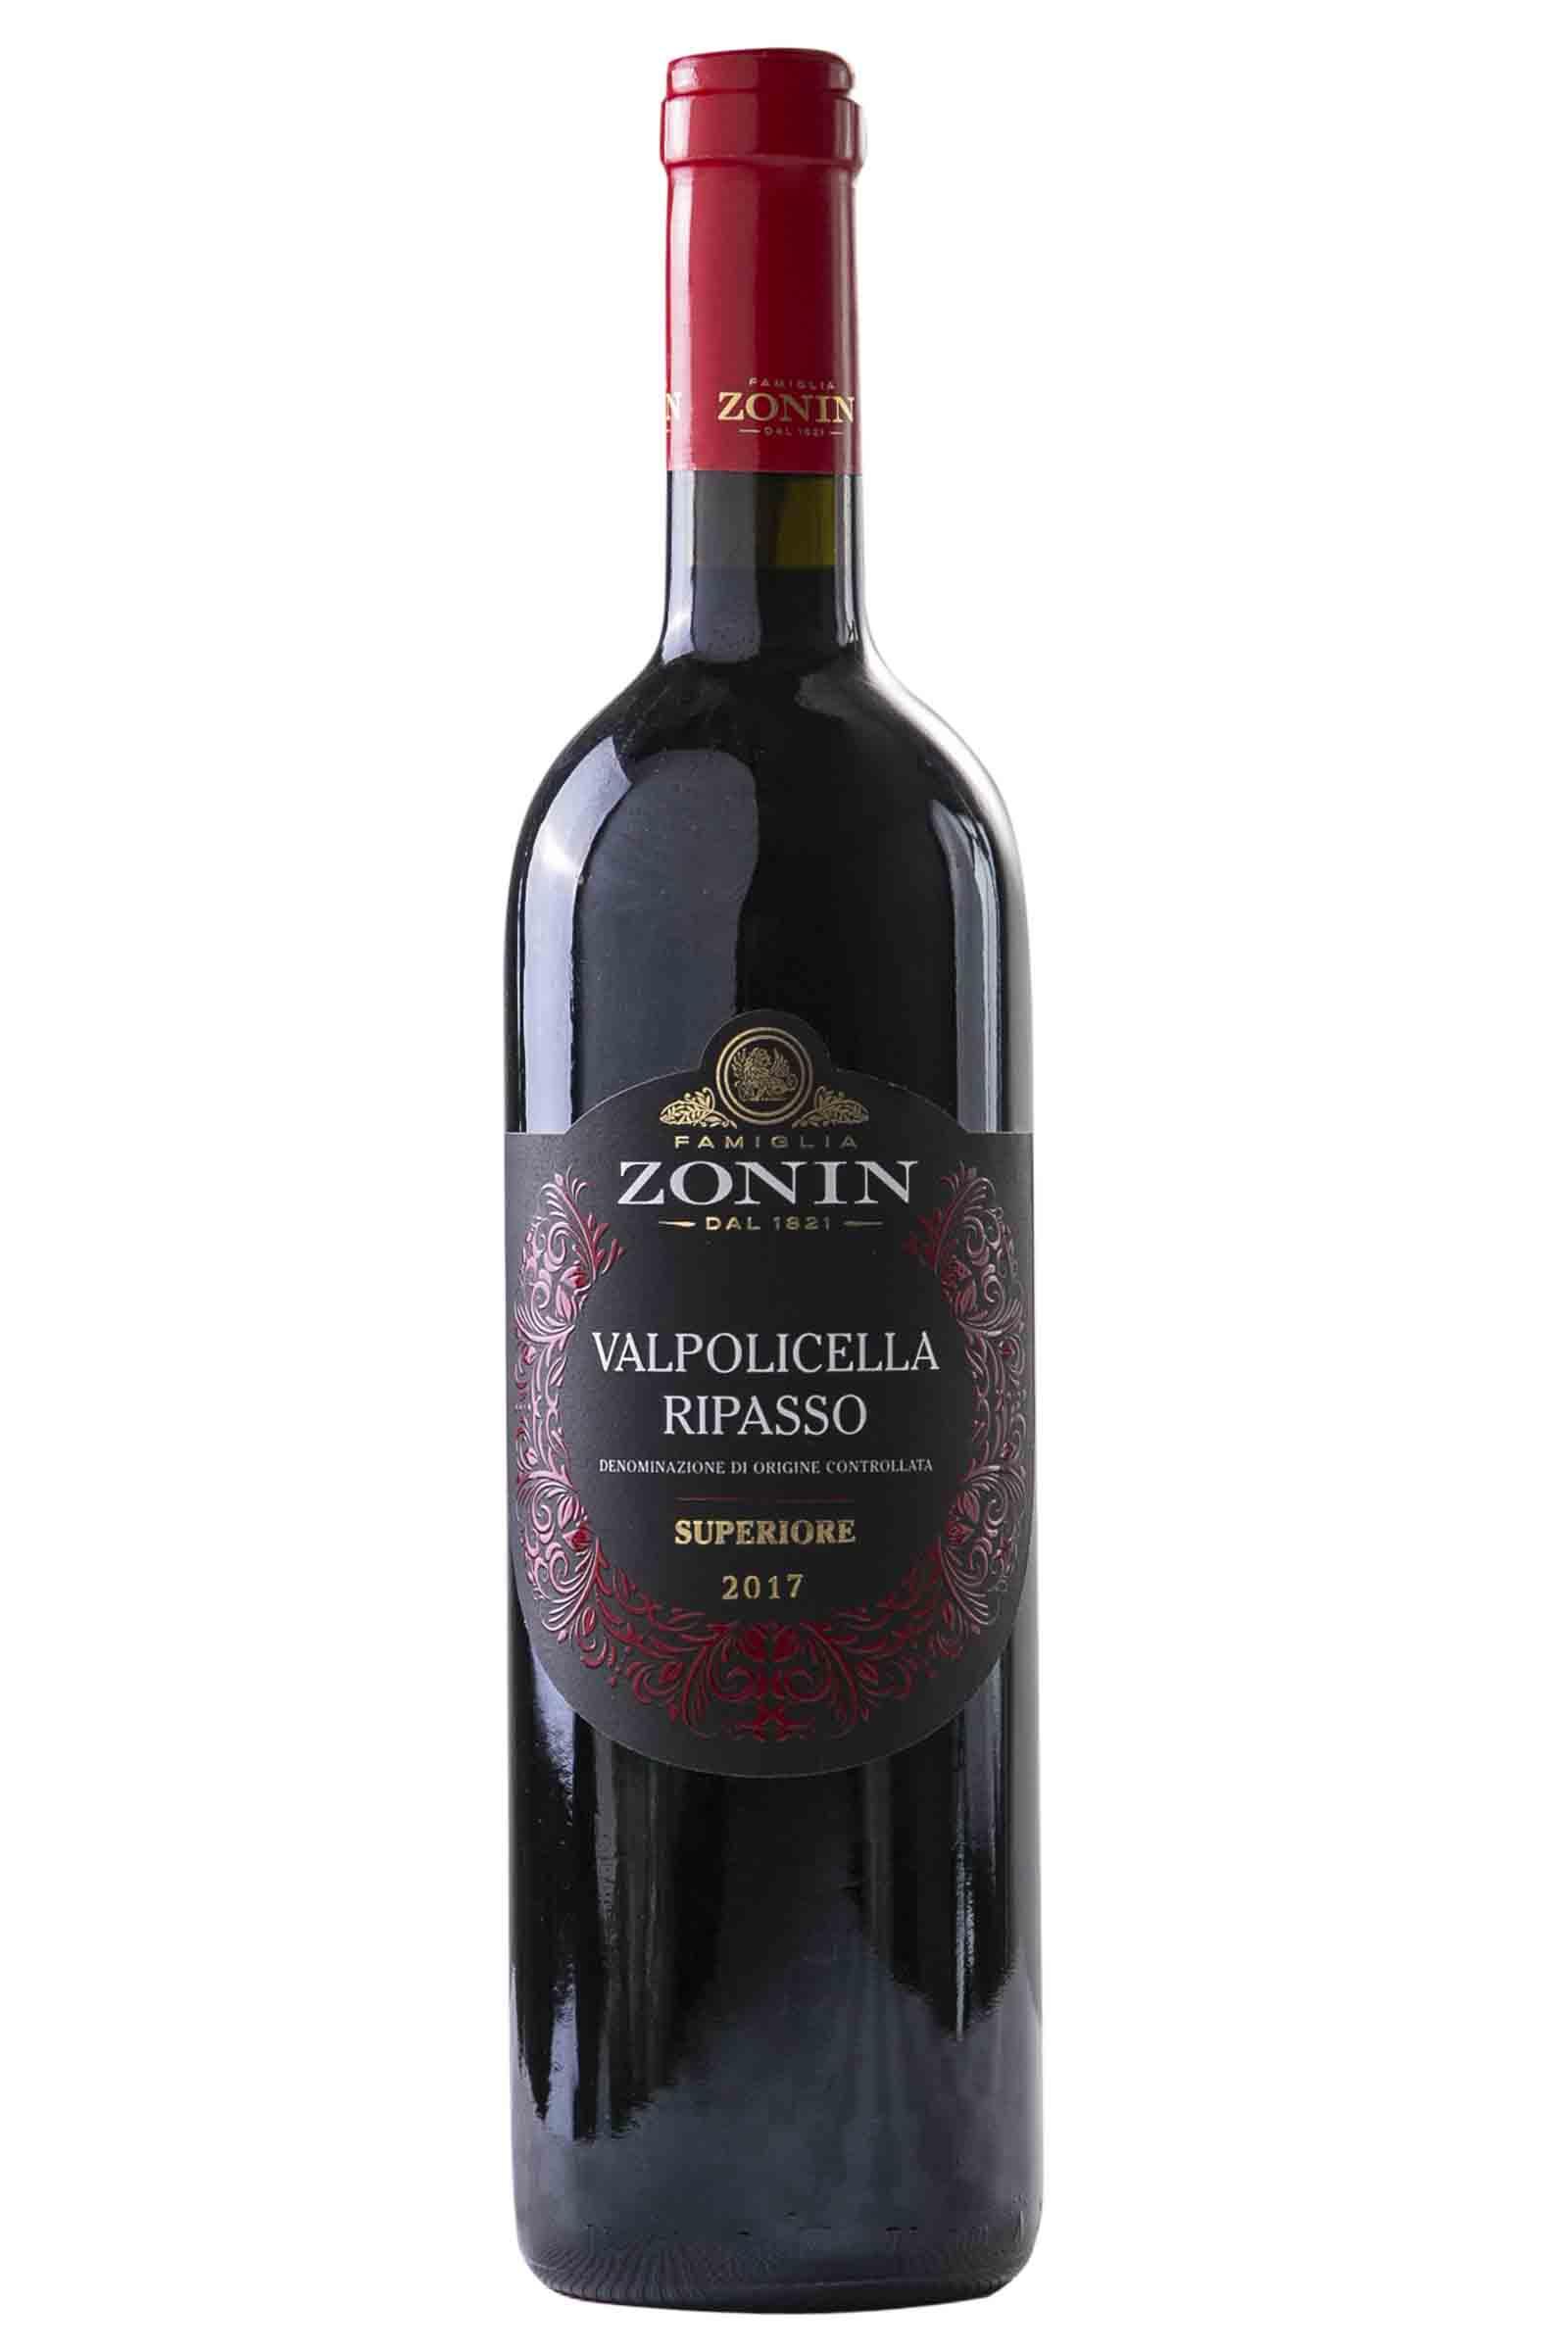 Vino Zonin Valpolicella Ripasso 750ml